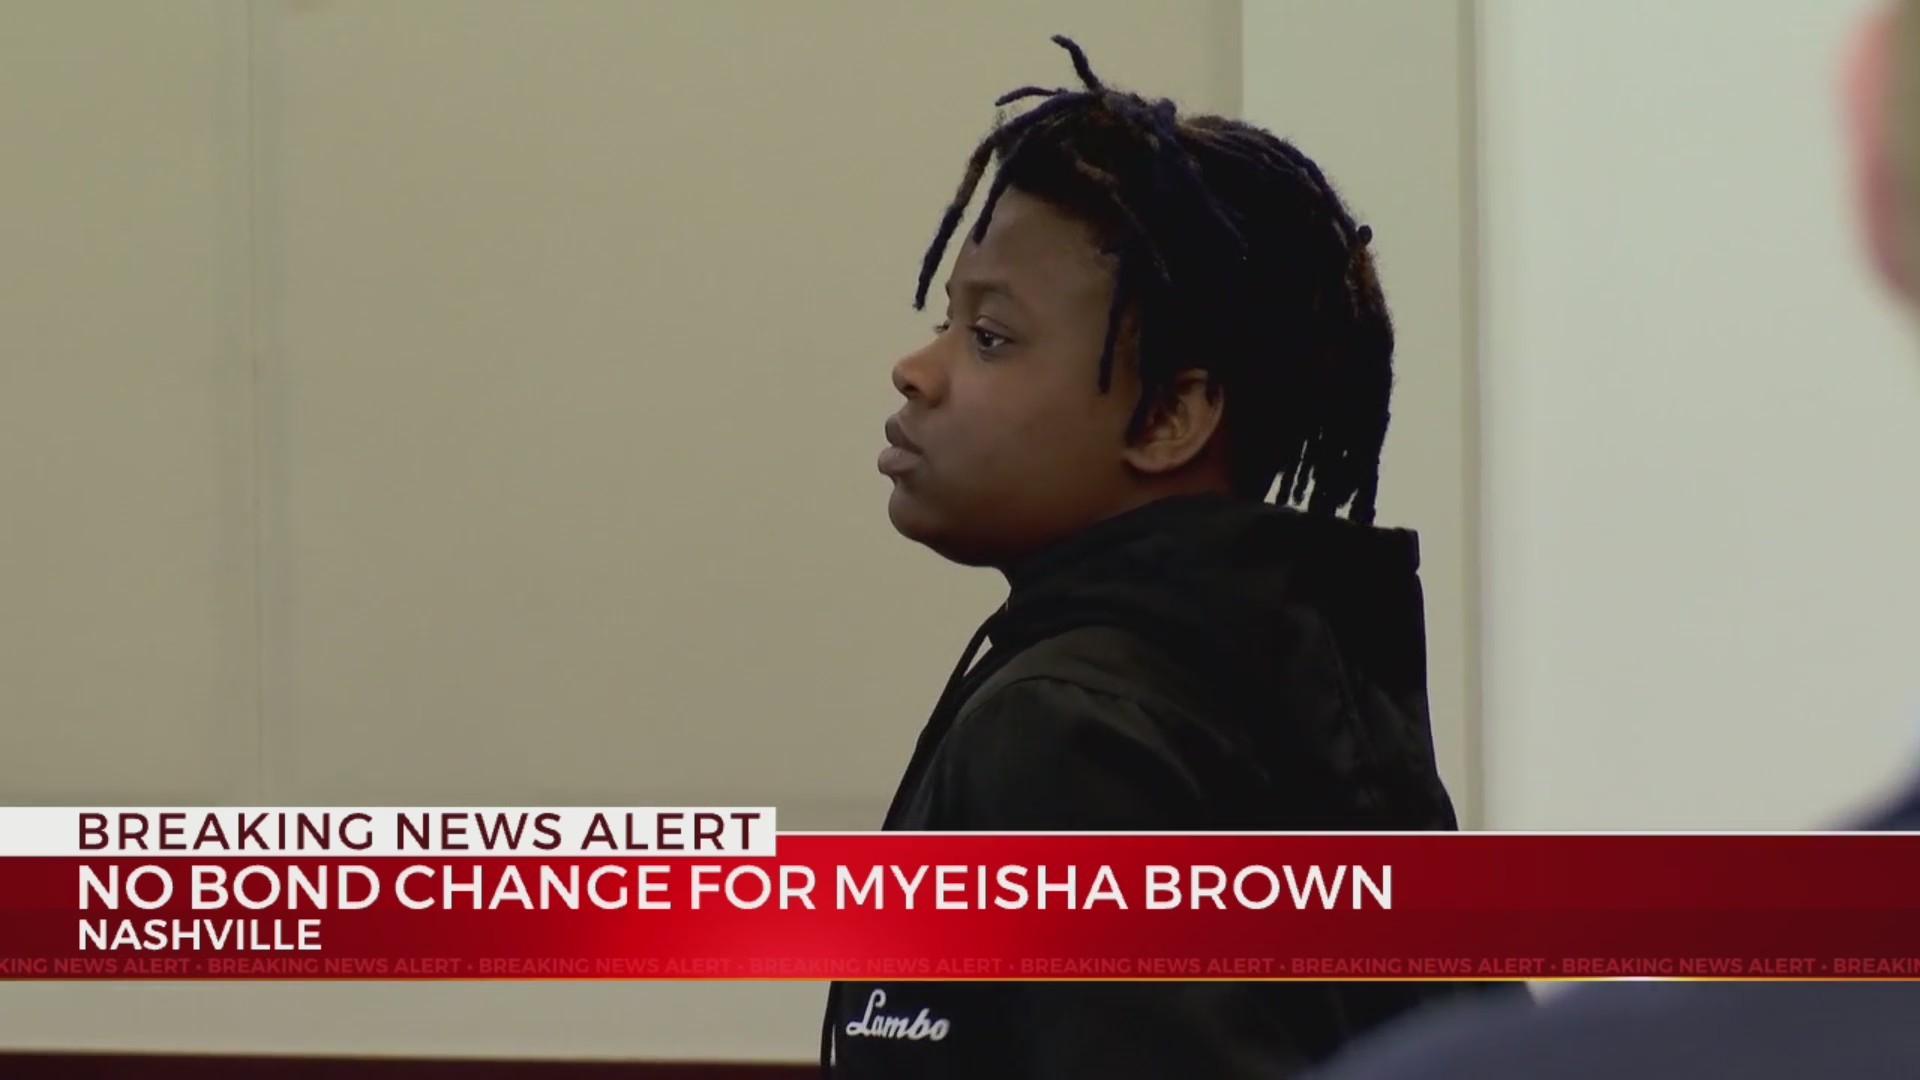 Judge does not revoke bond of 18-year-old murder suspect Myeisha Brown